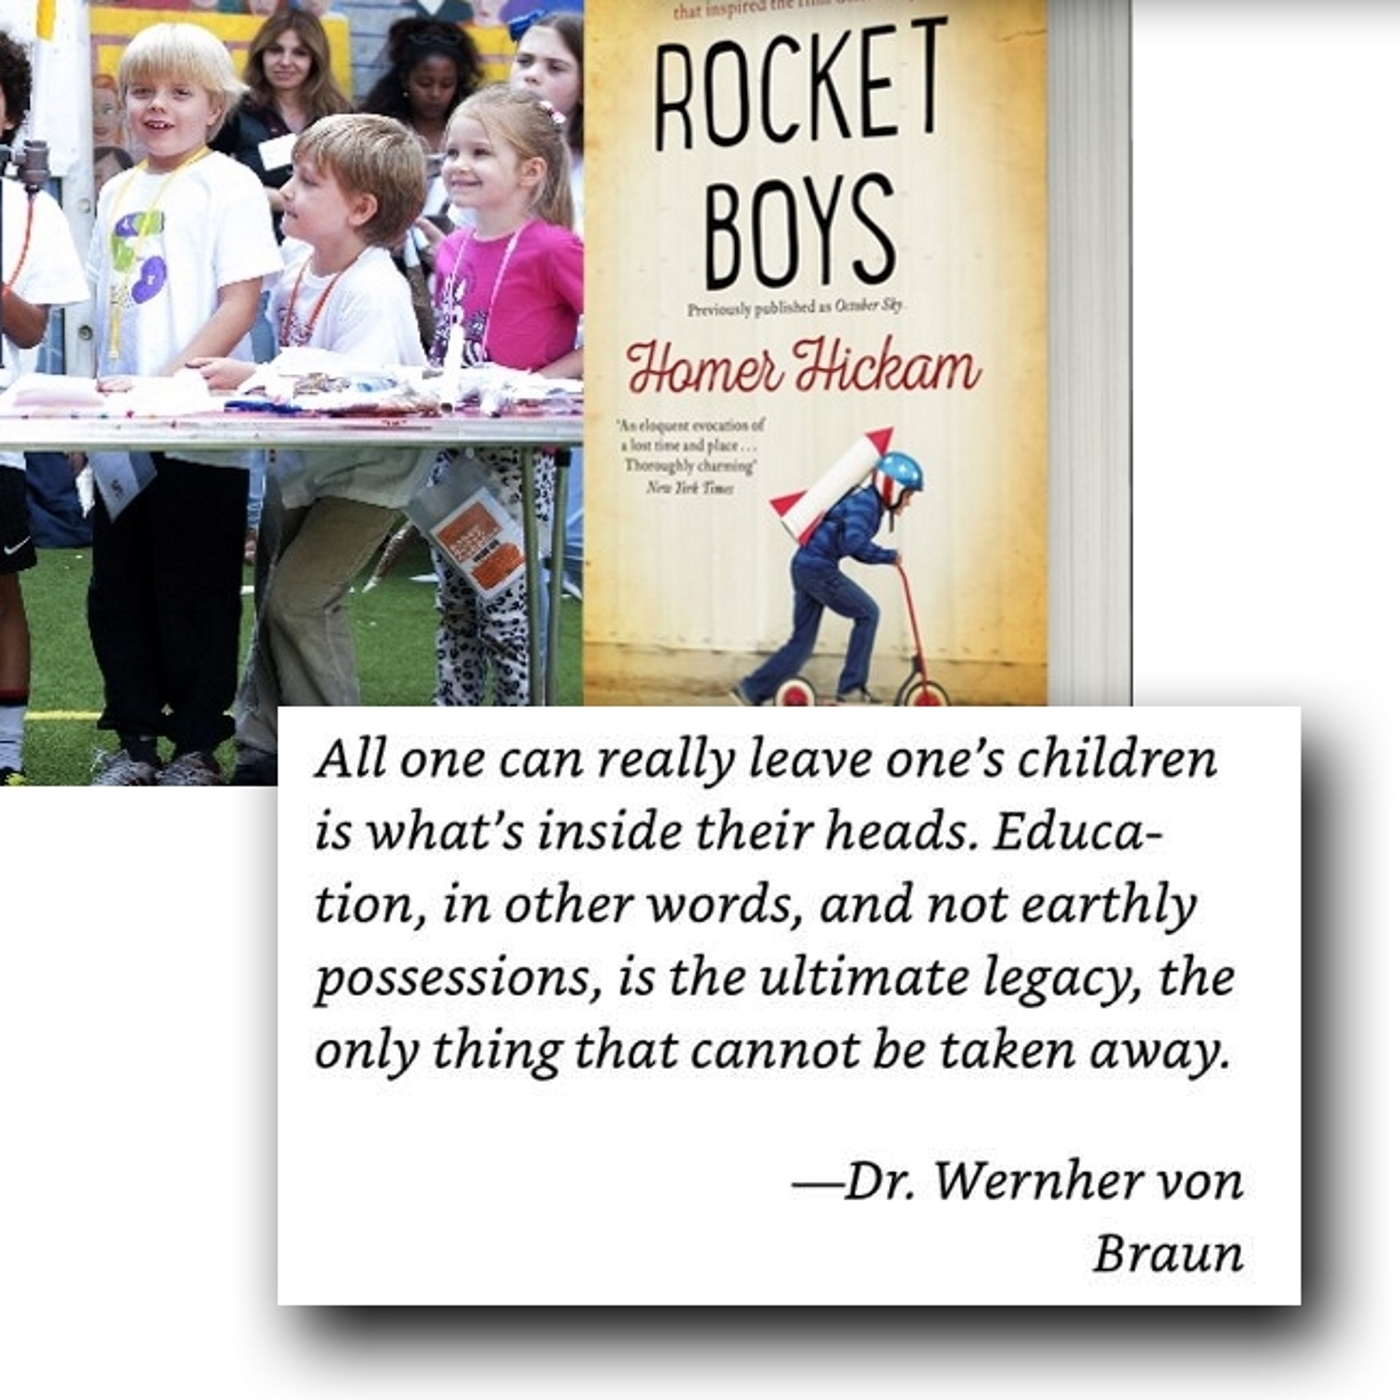 Rocket Boys book comp 2.jpg